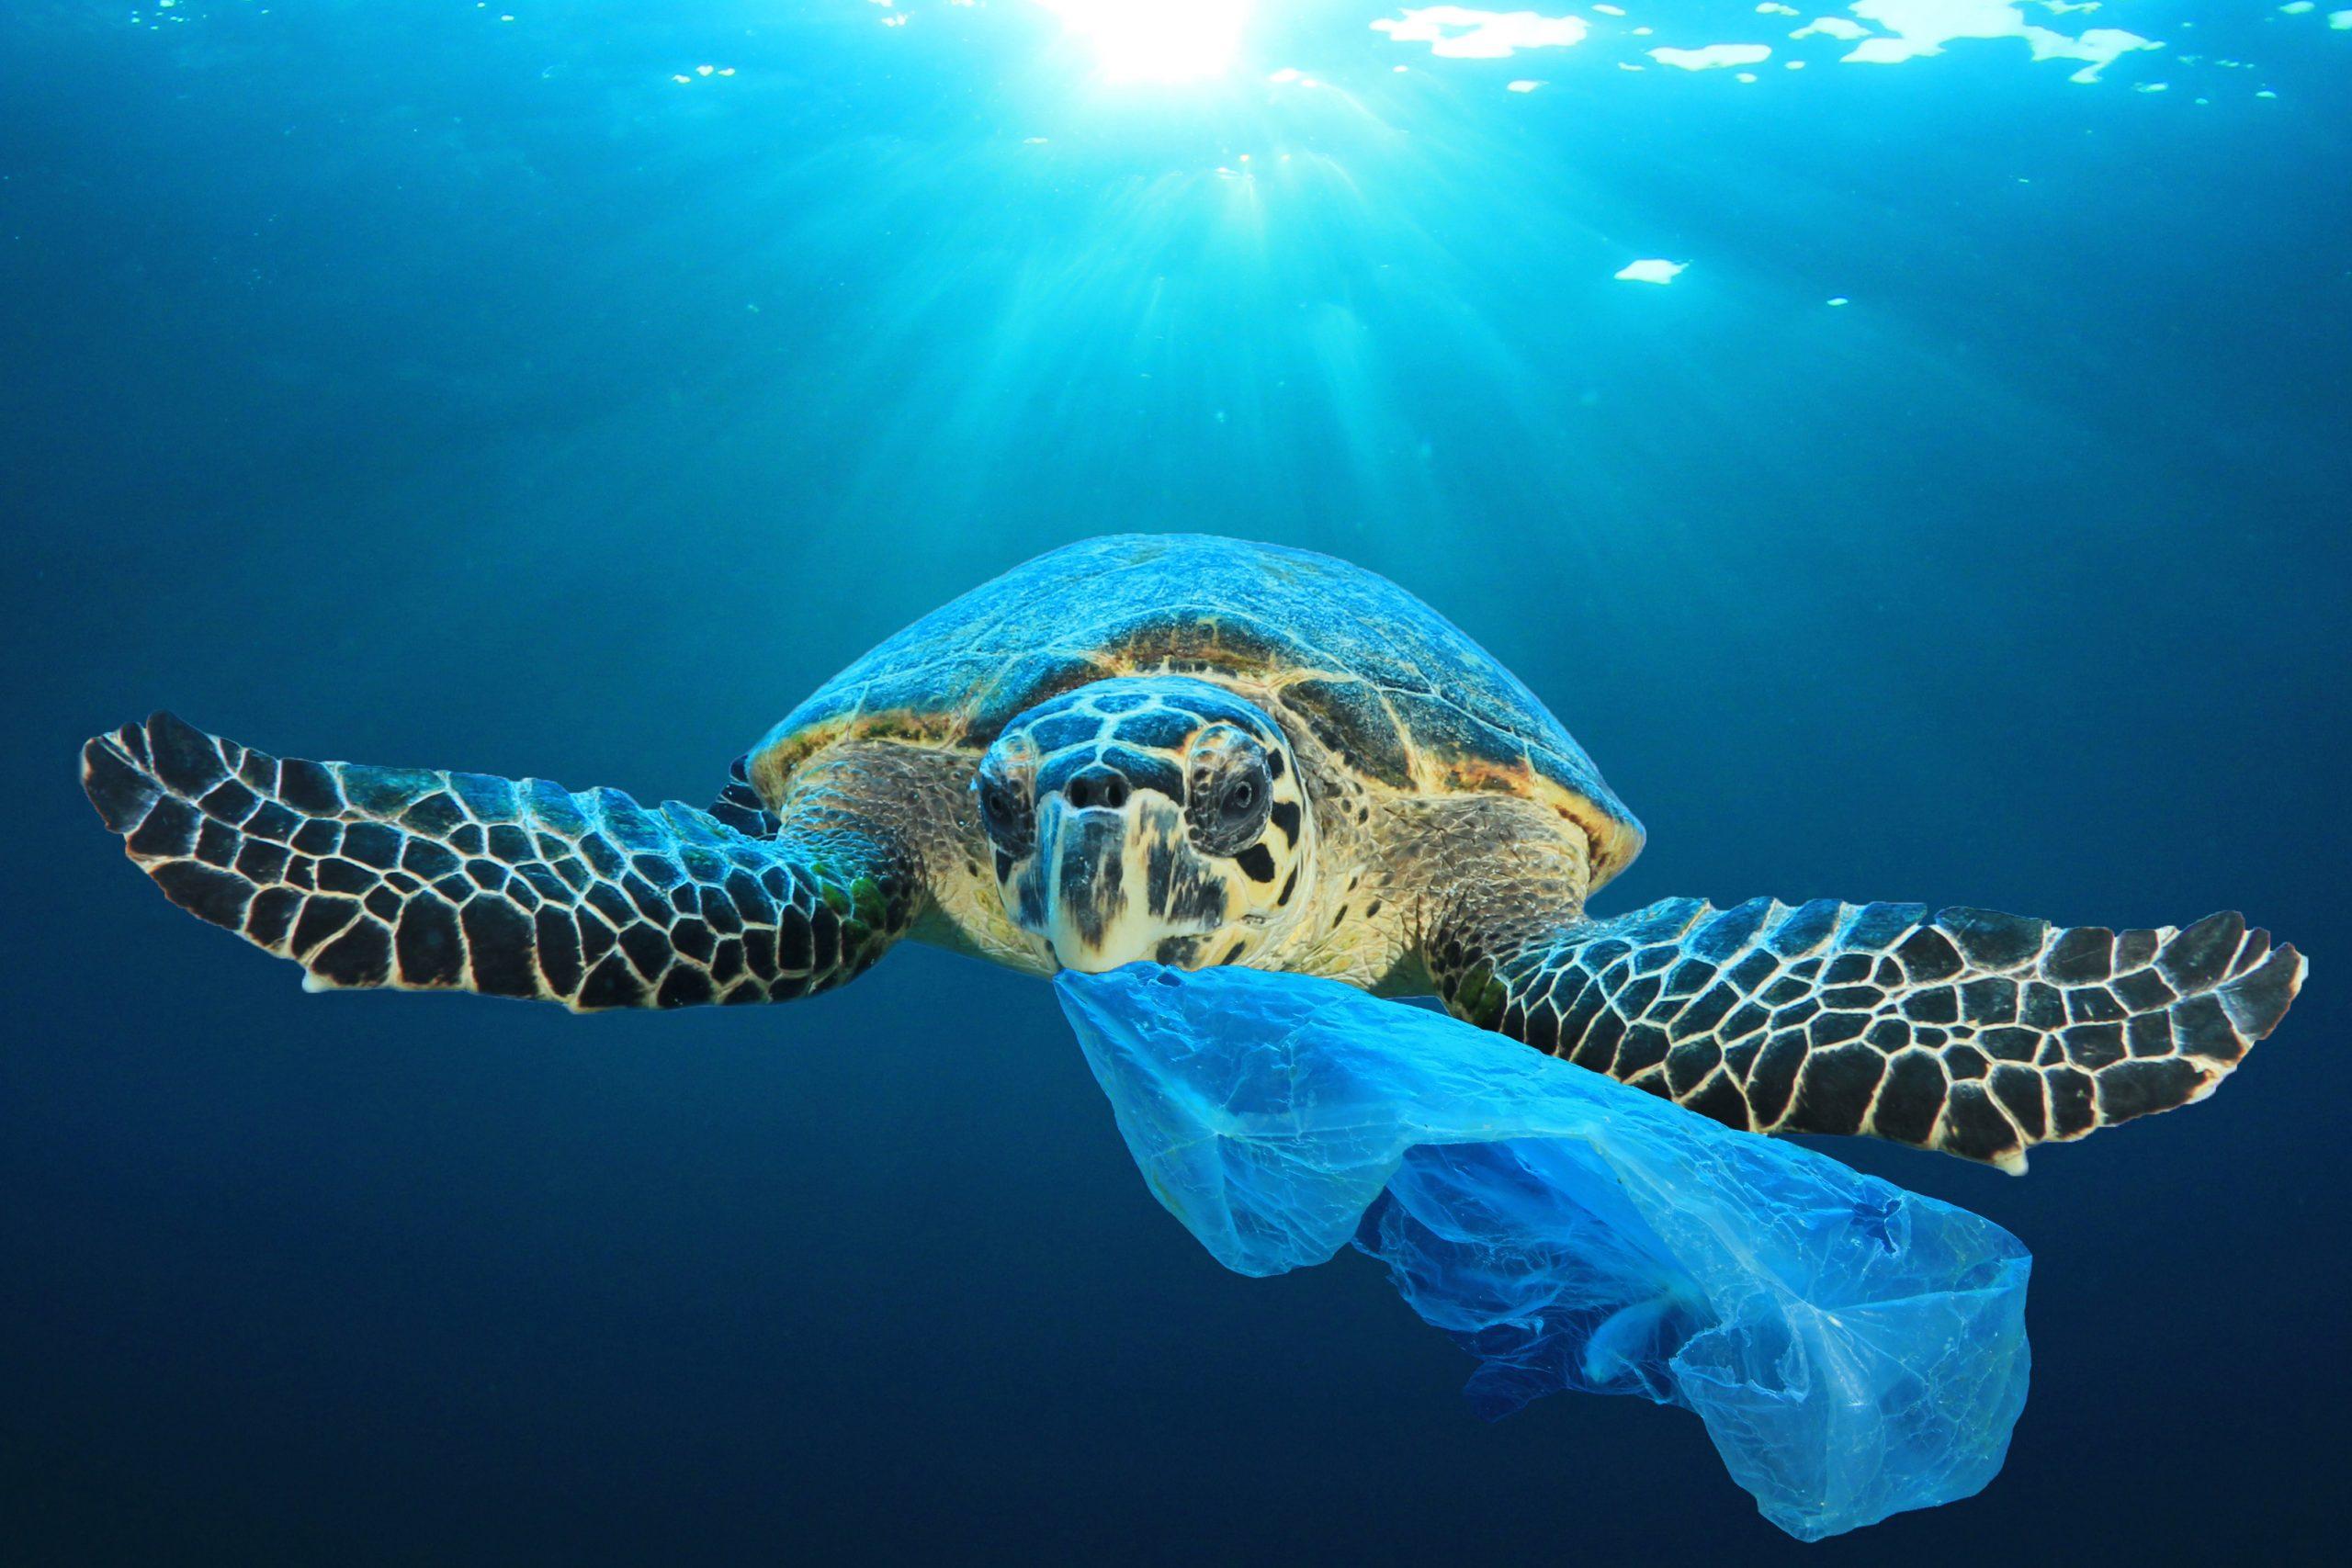 Sea Turtle with Plastic